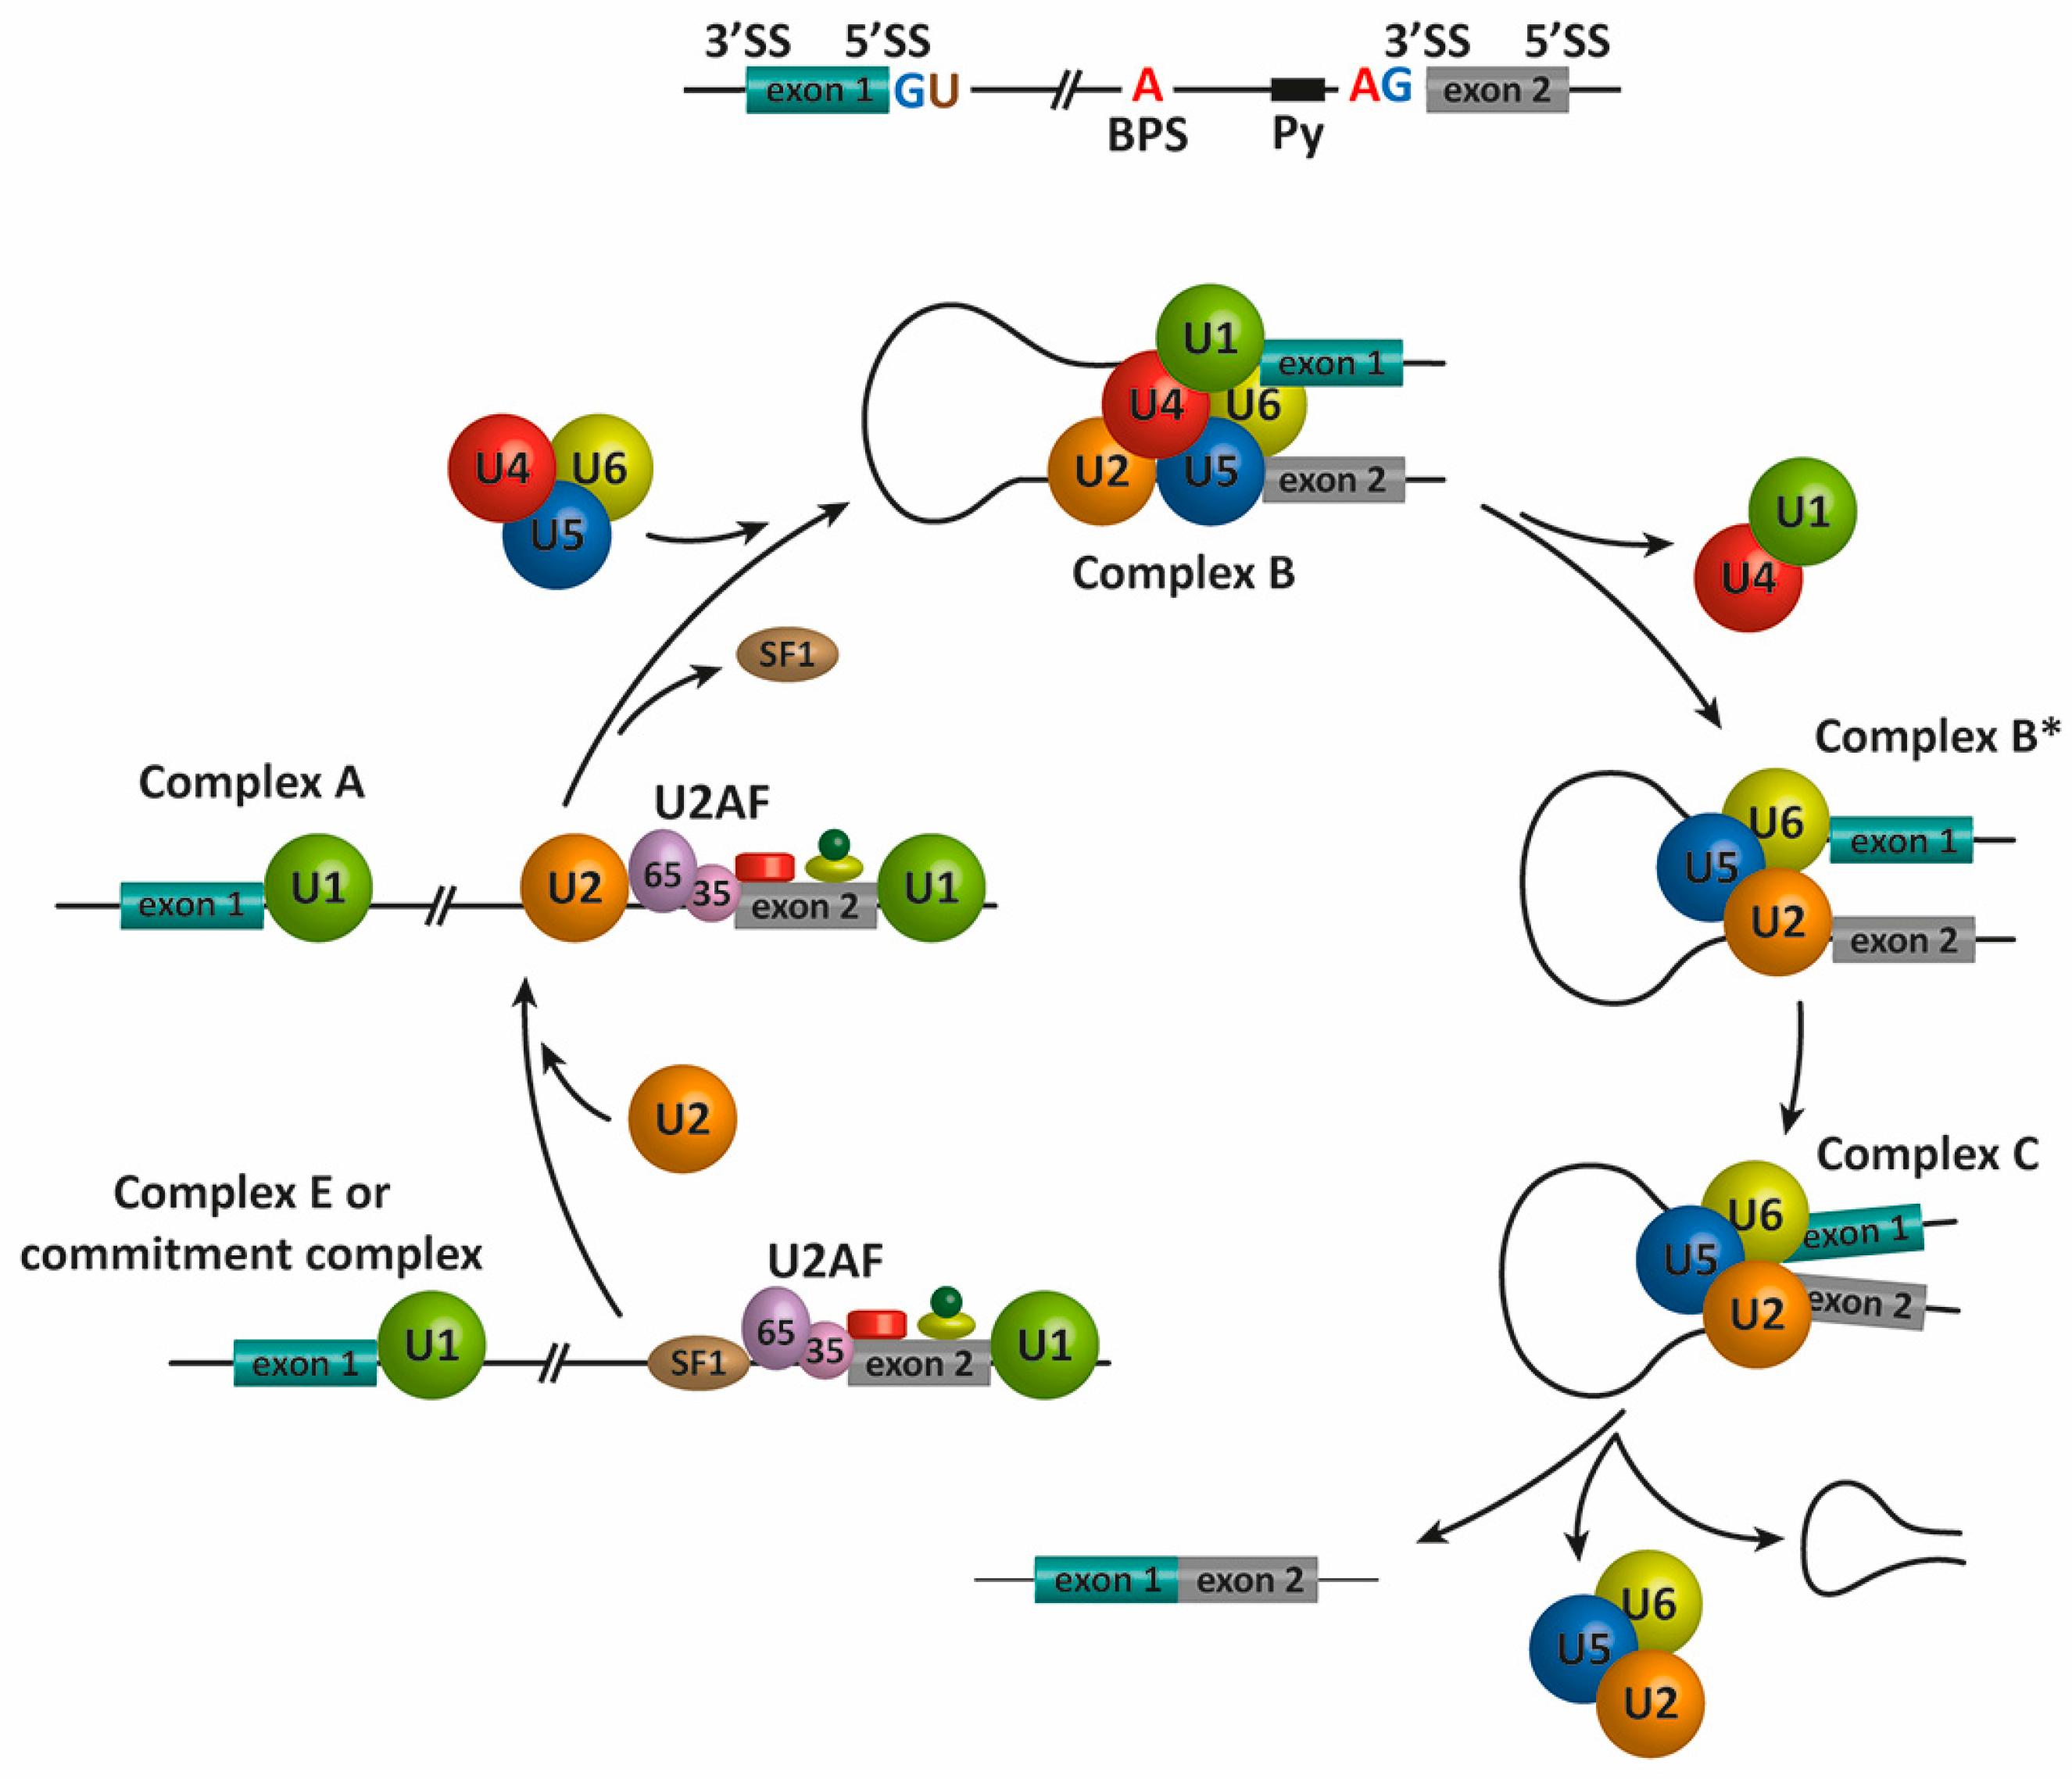 Genes 08 00087 g001